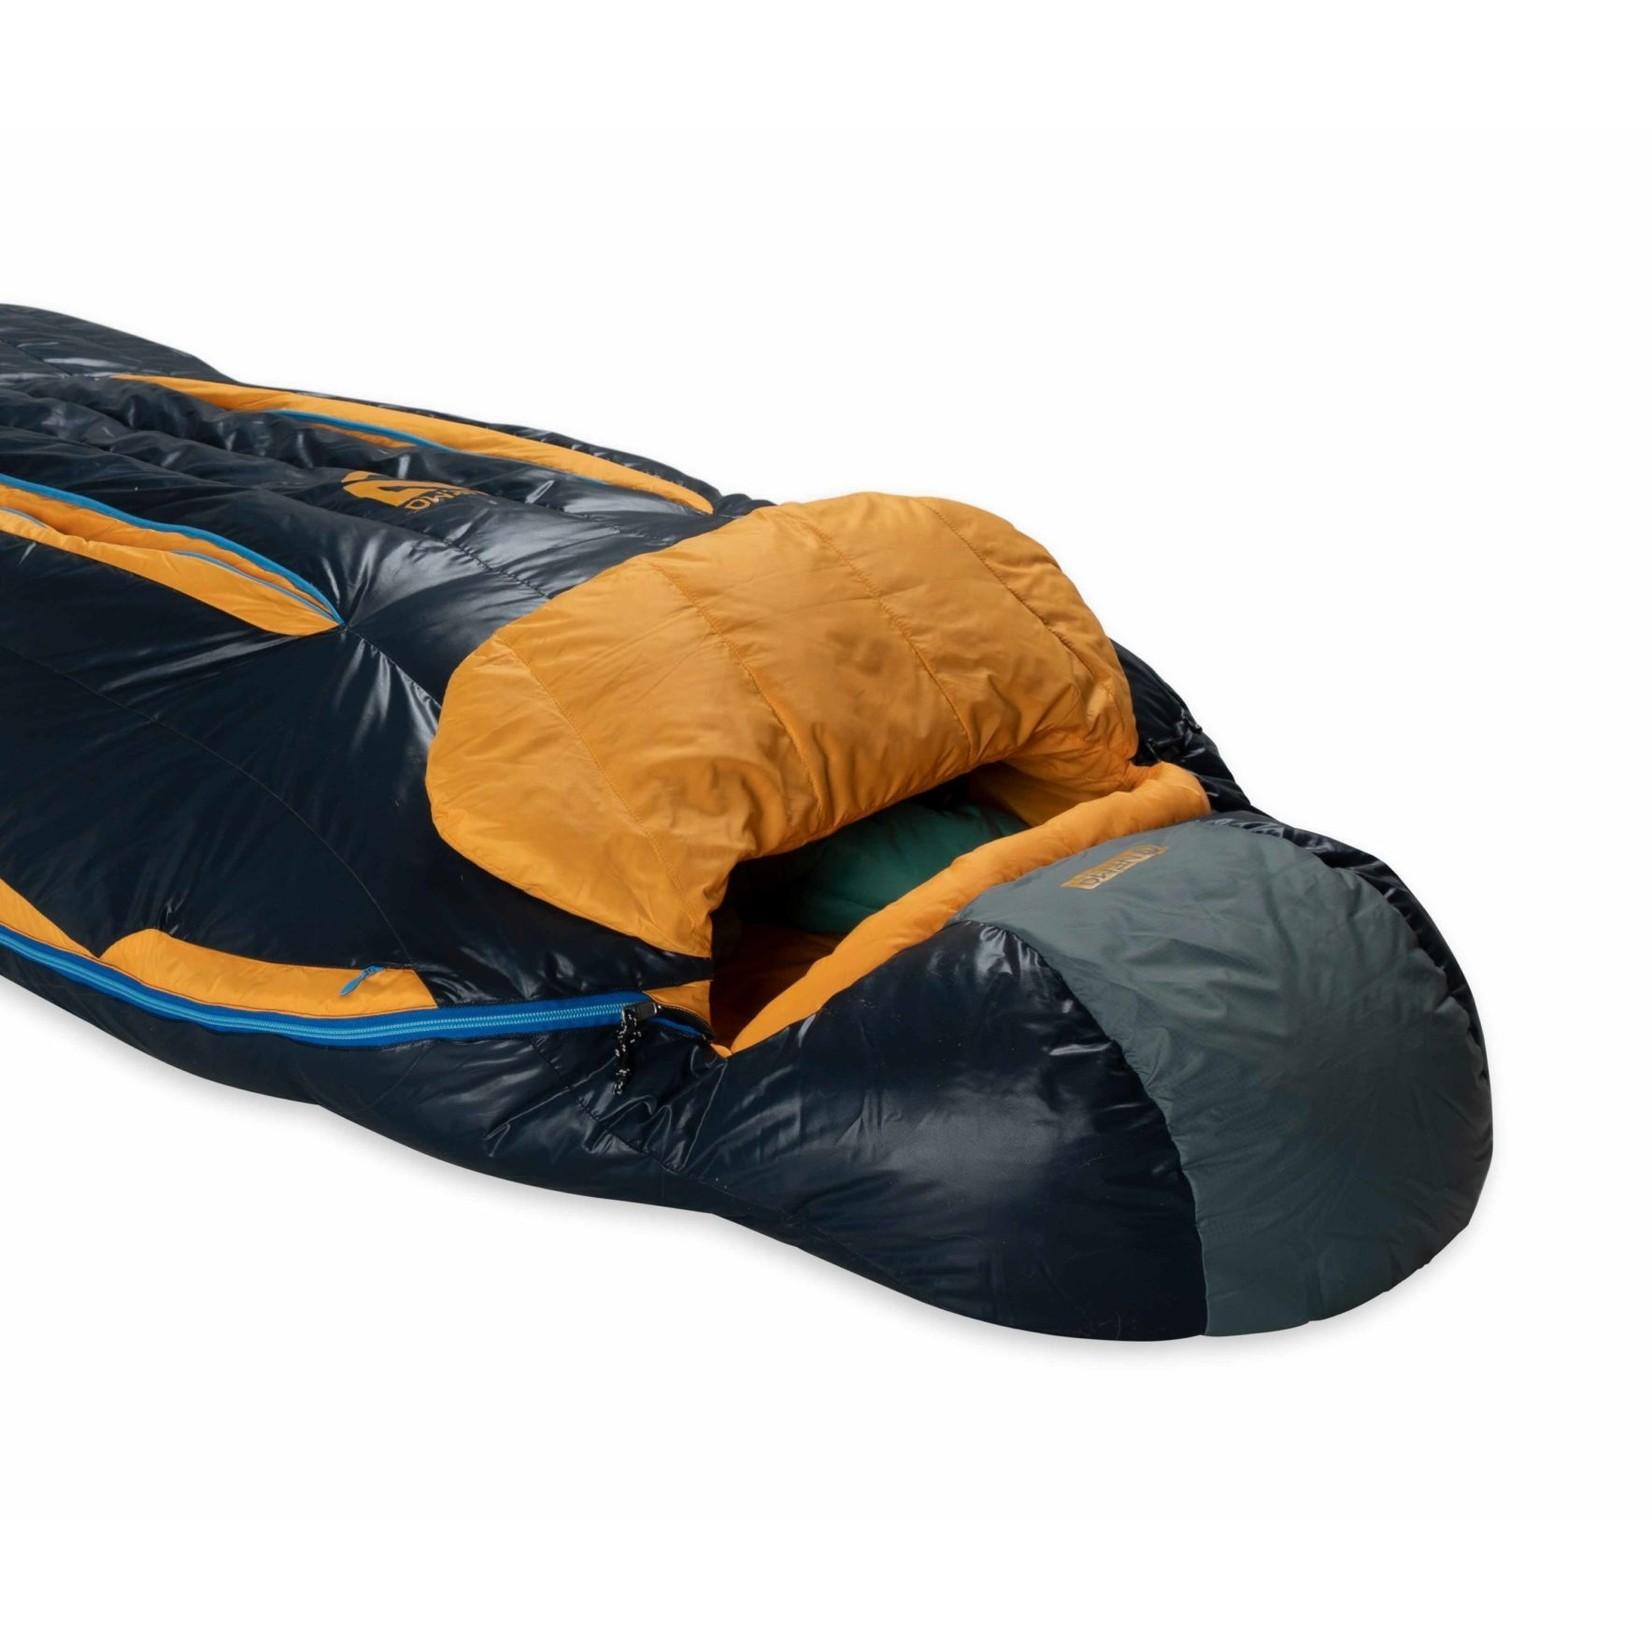 NEMO Disco™ Men's Down Sleeping Bag